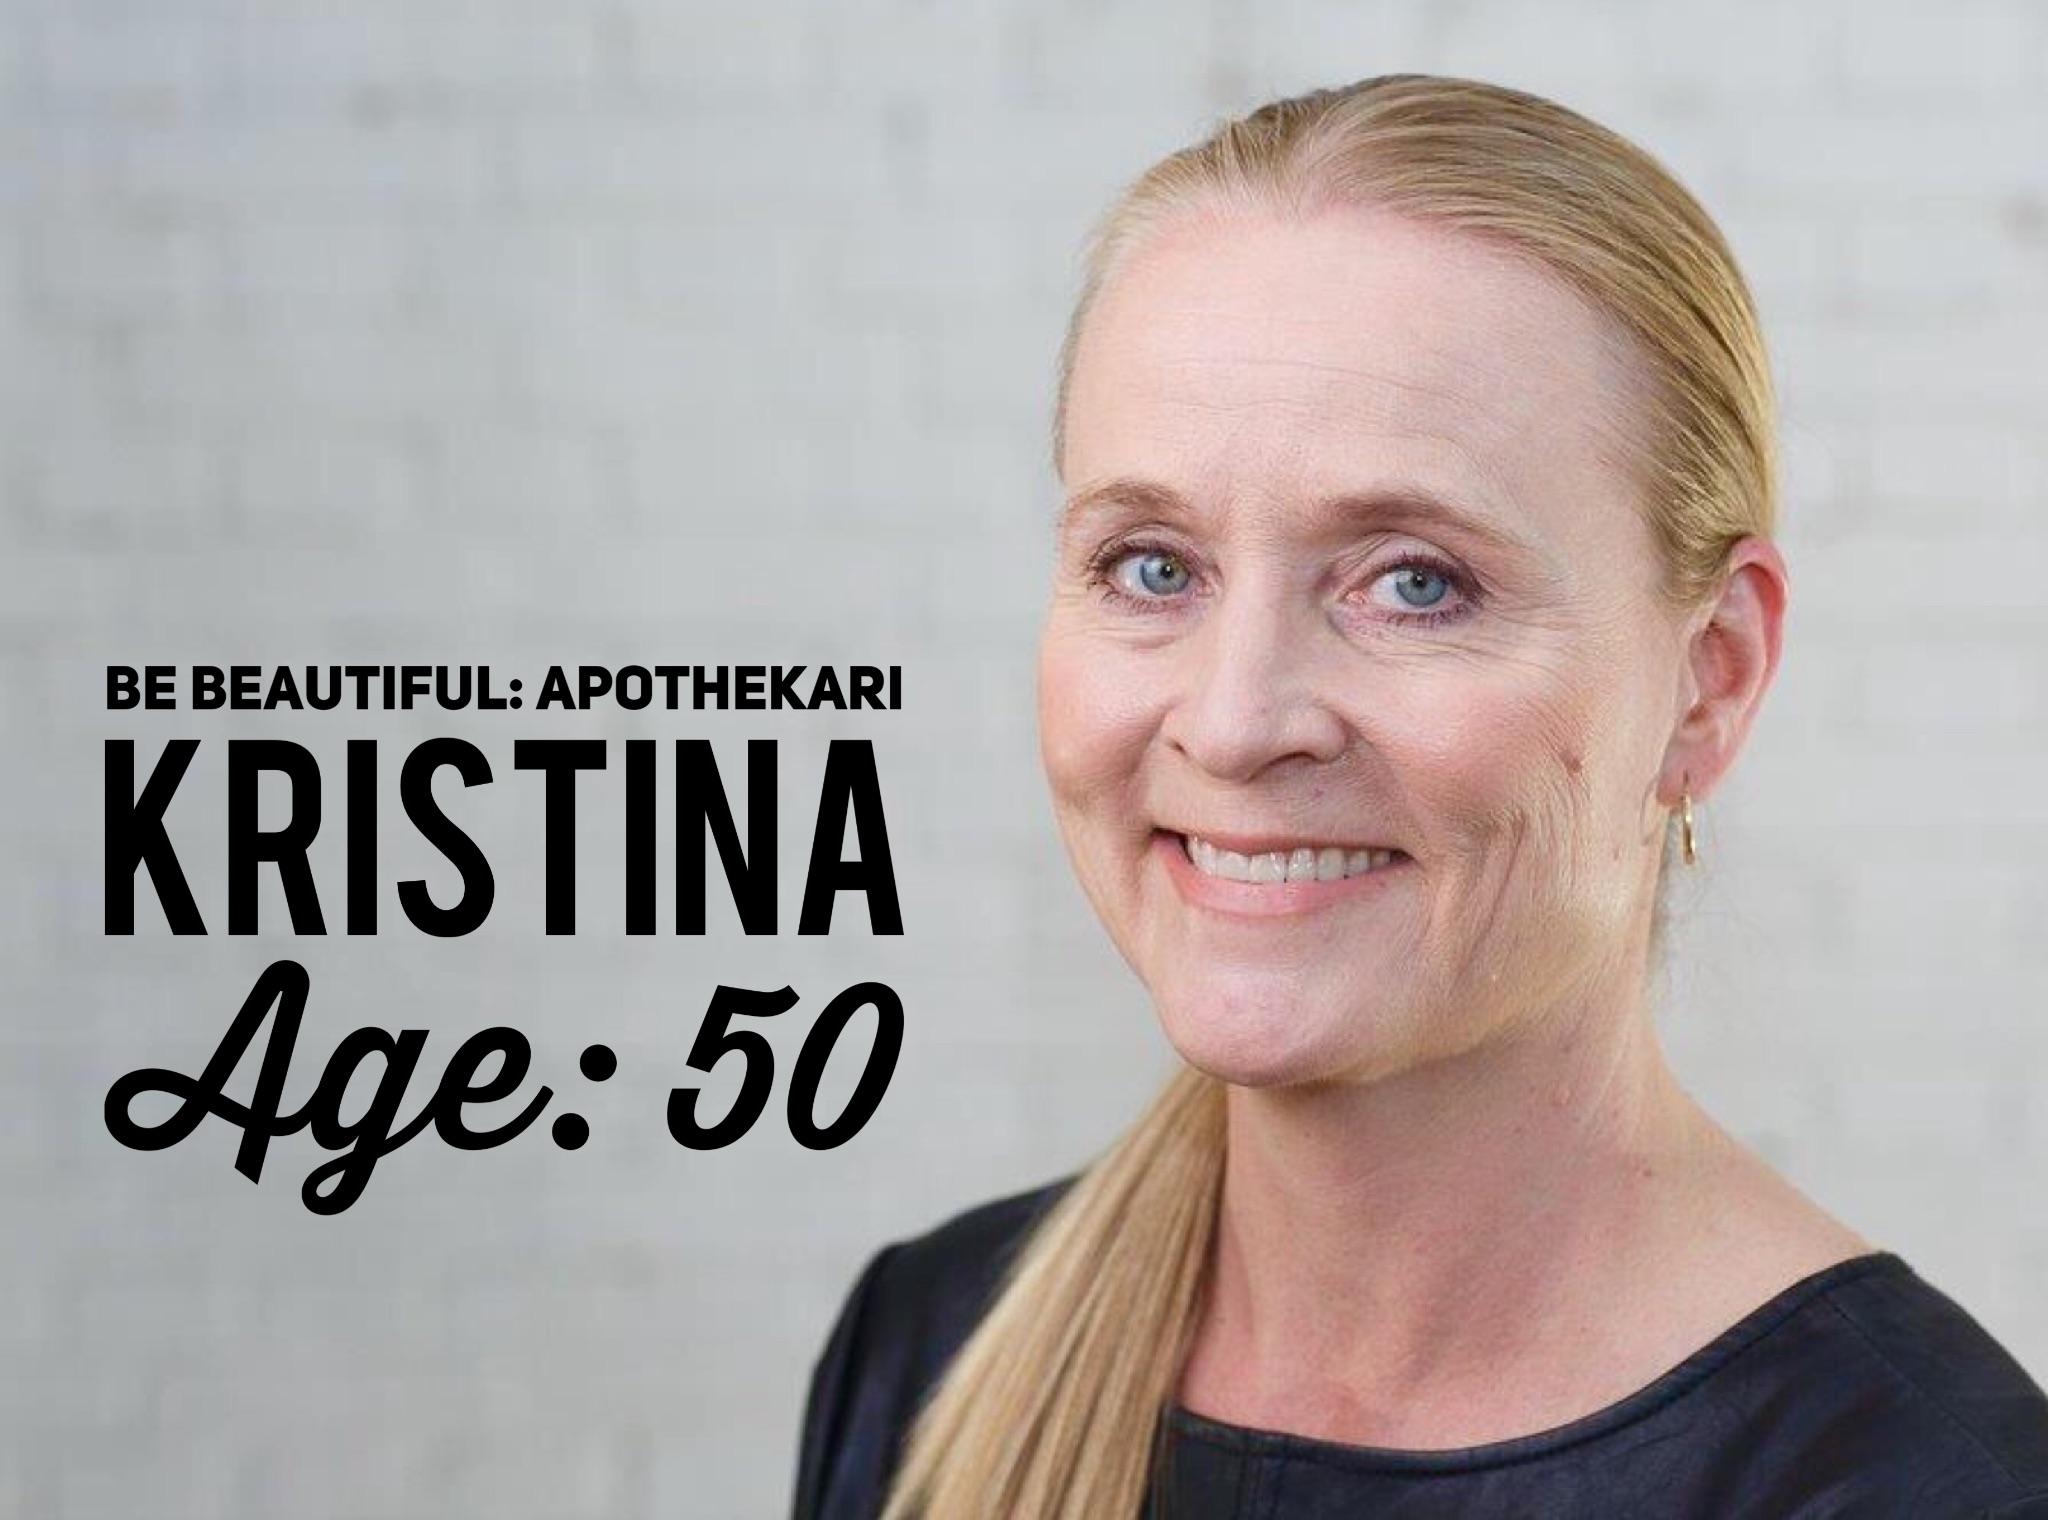 August's Be Beautiful Apothekari: Kristina